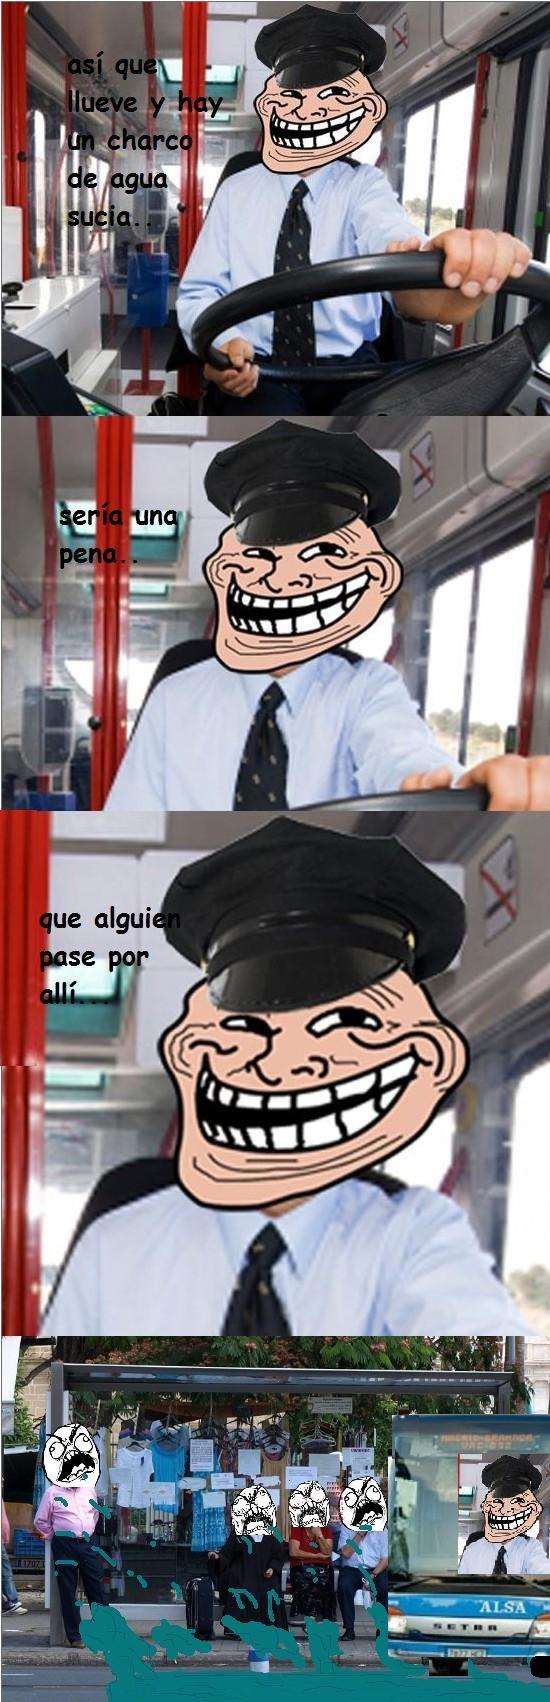 Trollface - Conductores troll de autobús